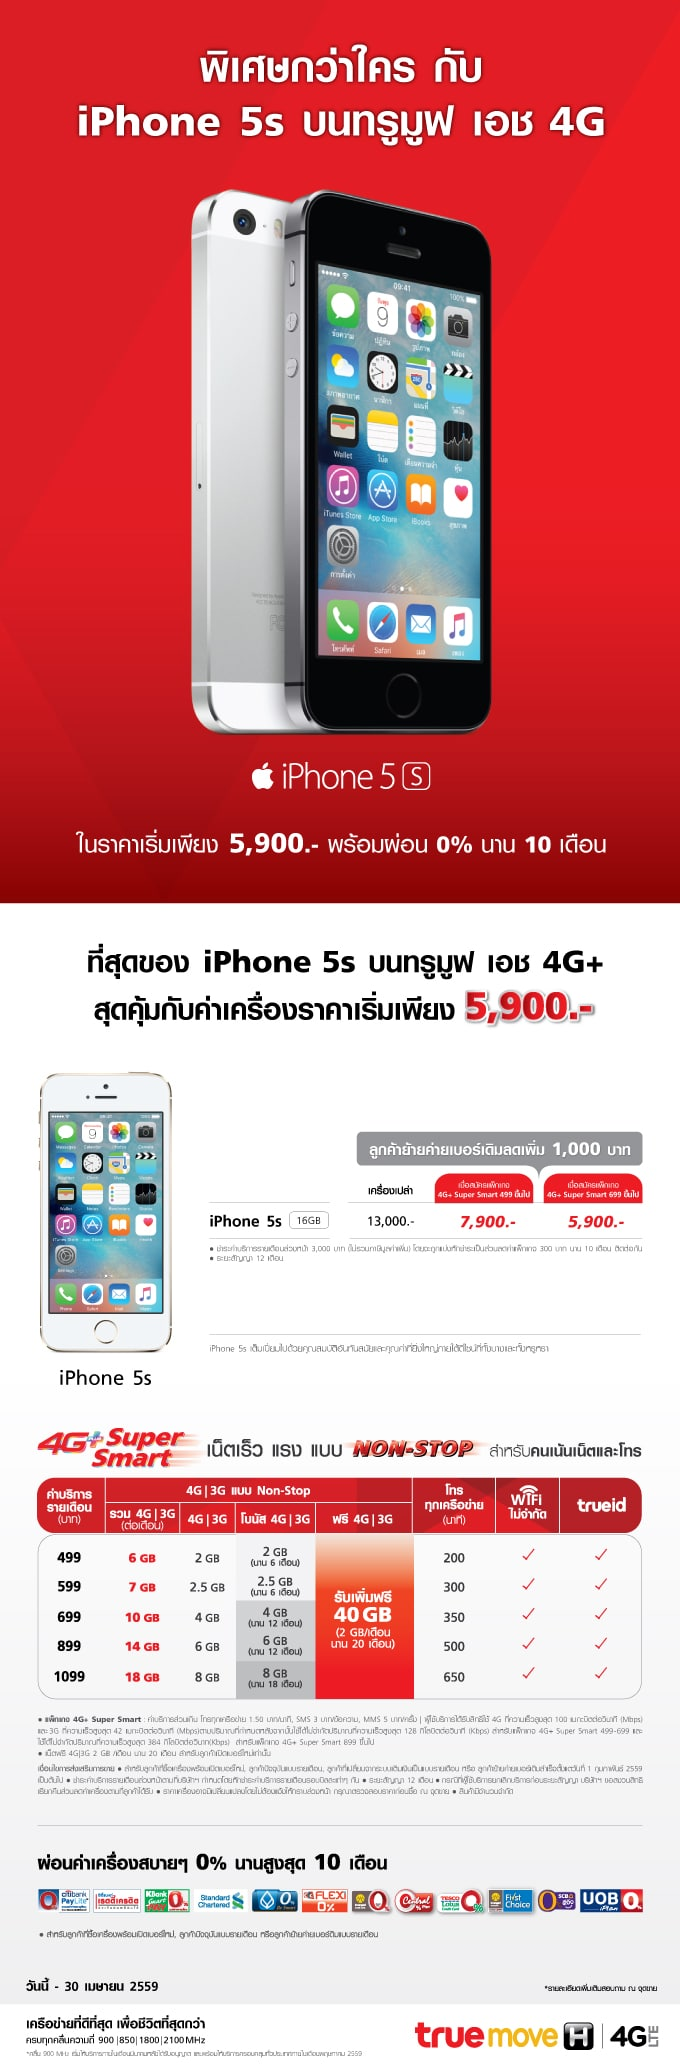 truemove-h-promotion-iphone-5s-5900-baht-pro